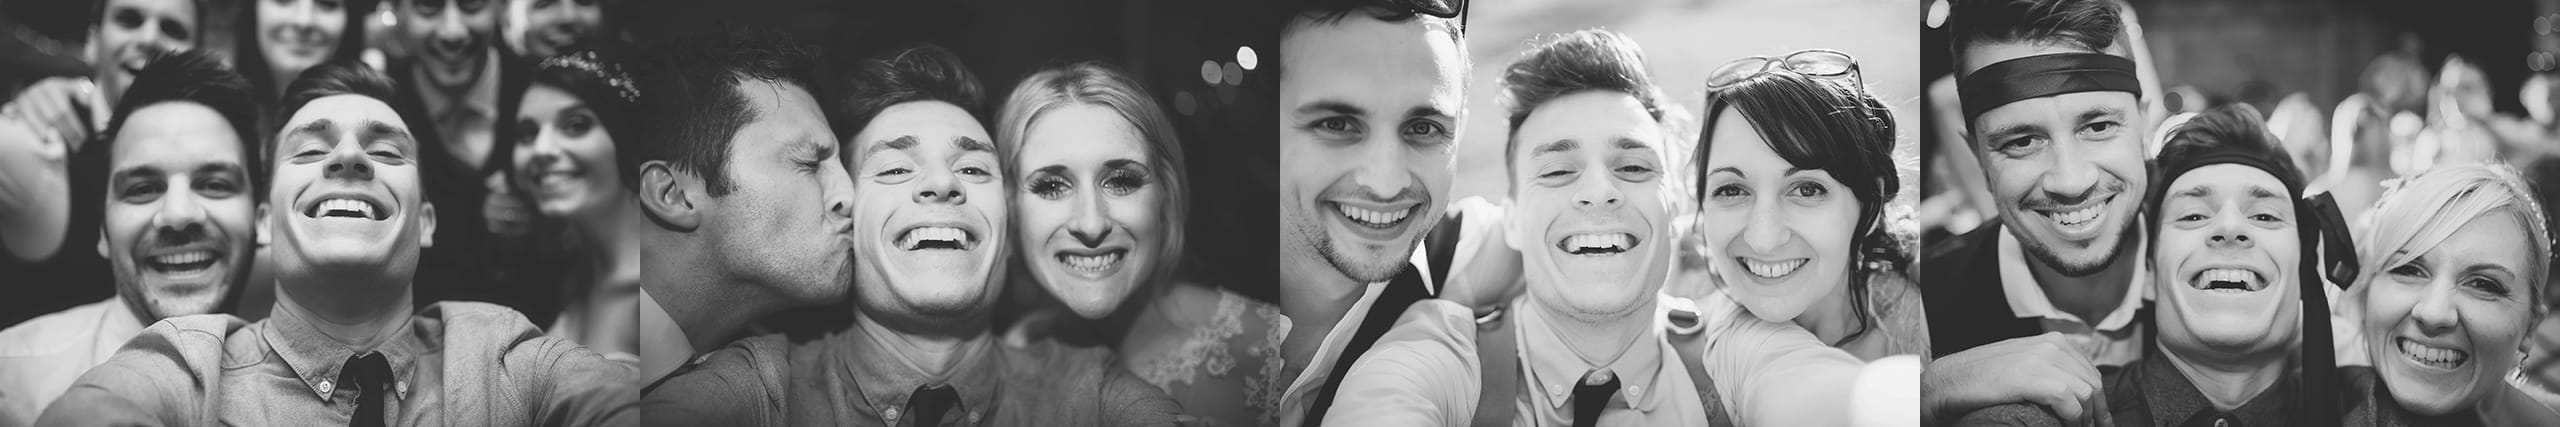 Cotswold Wedding Photographer - Joab Smith Wedding Photographer